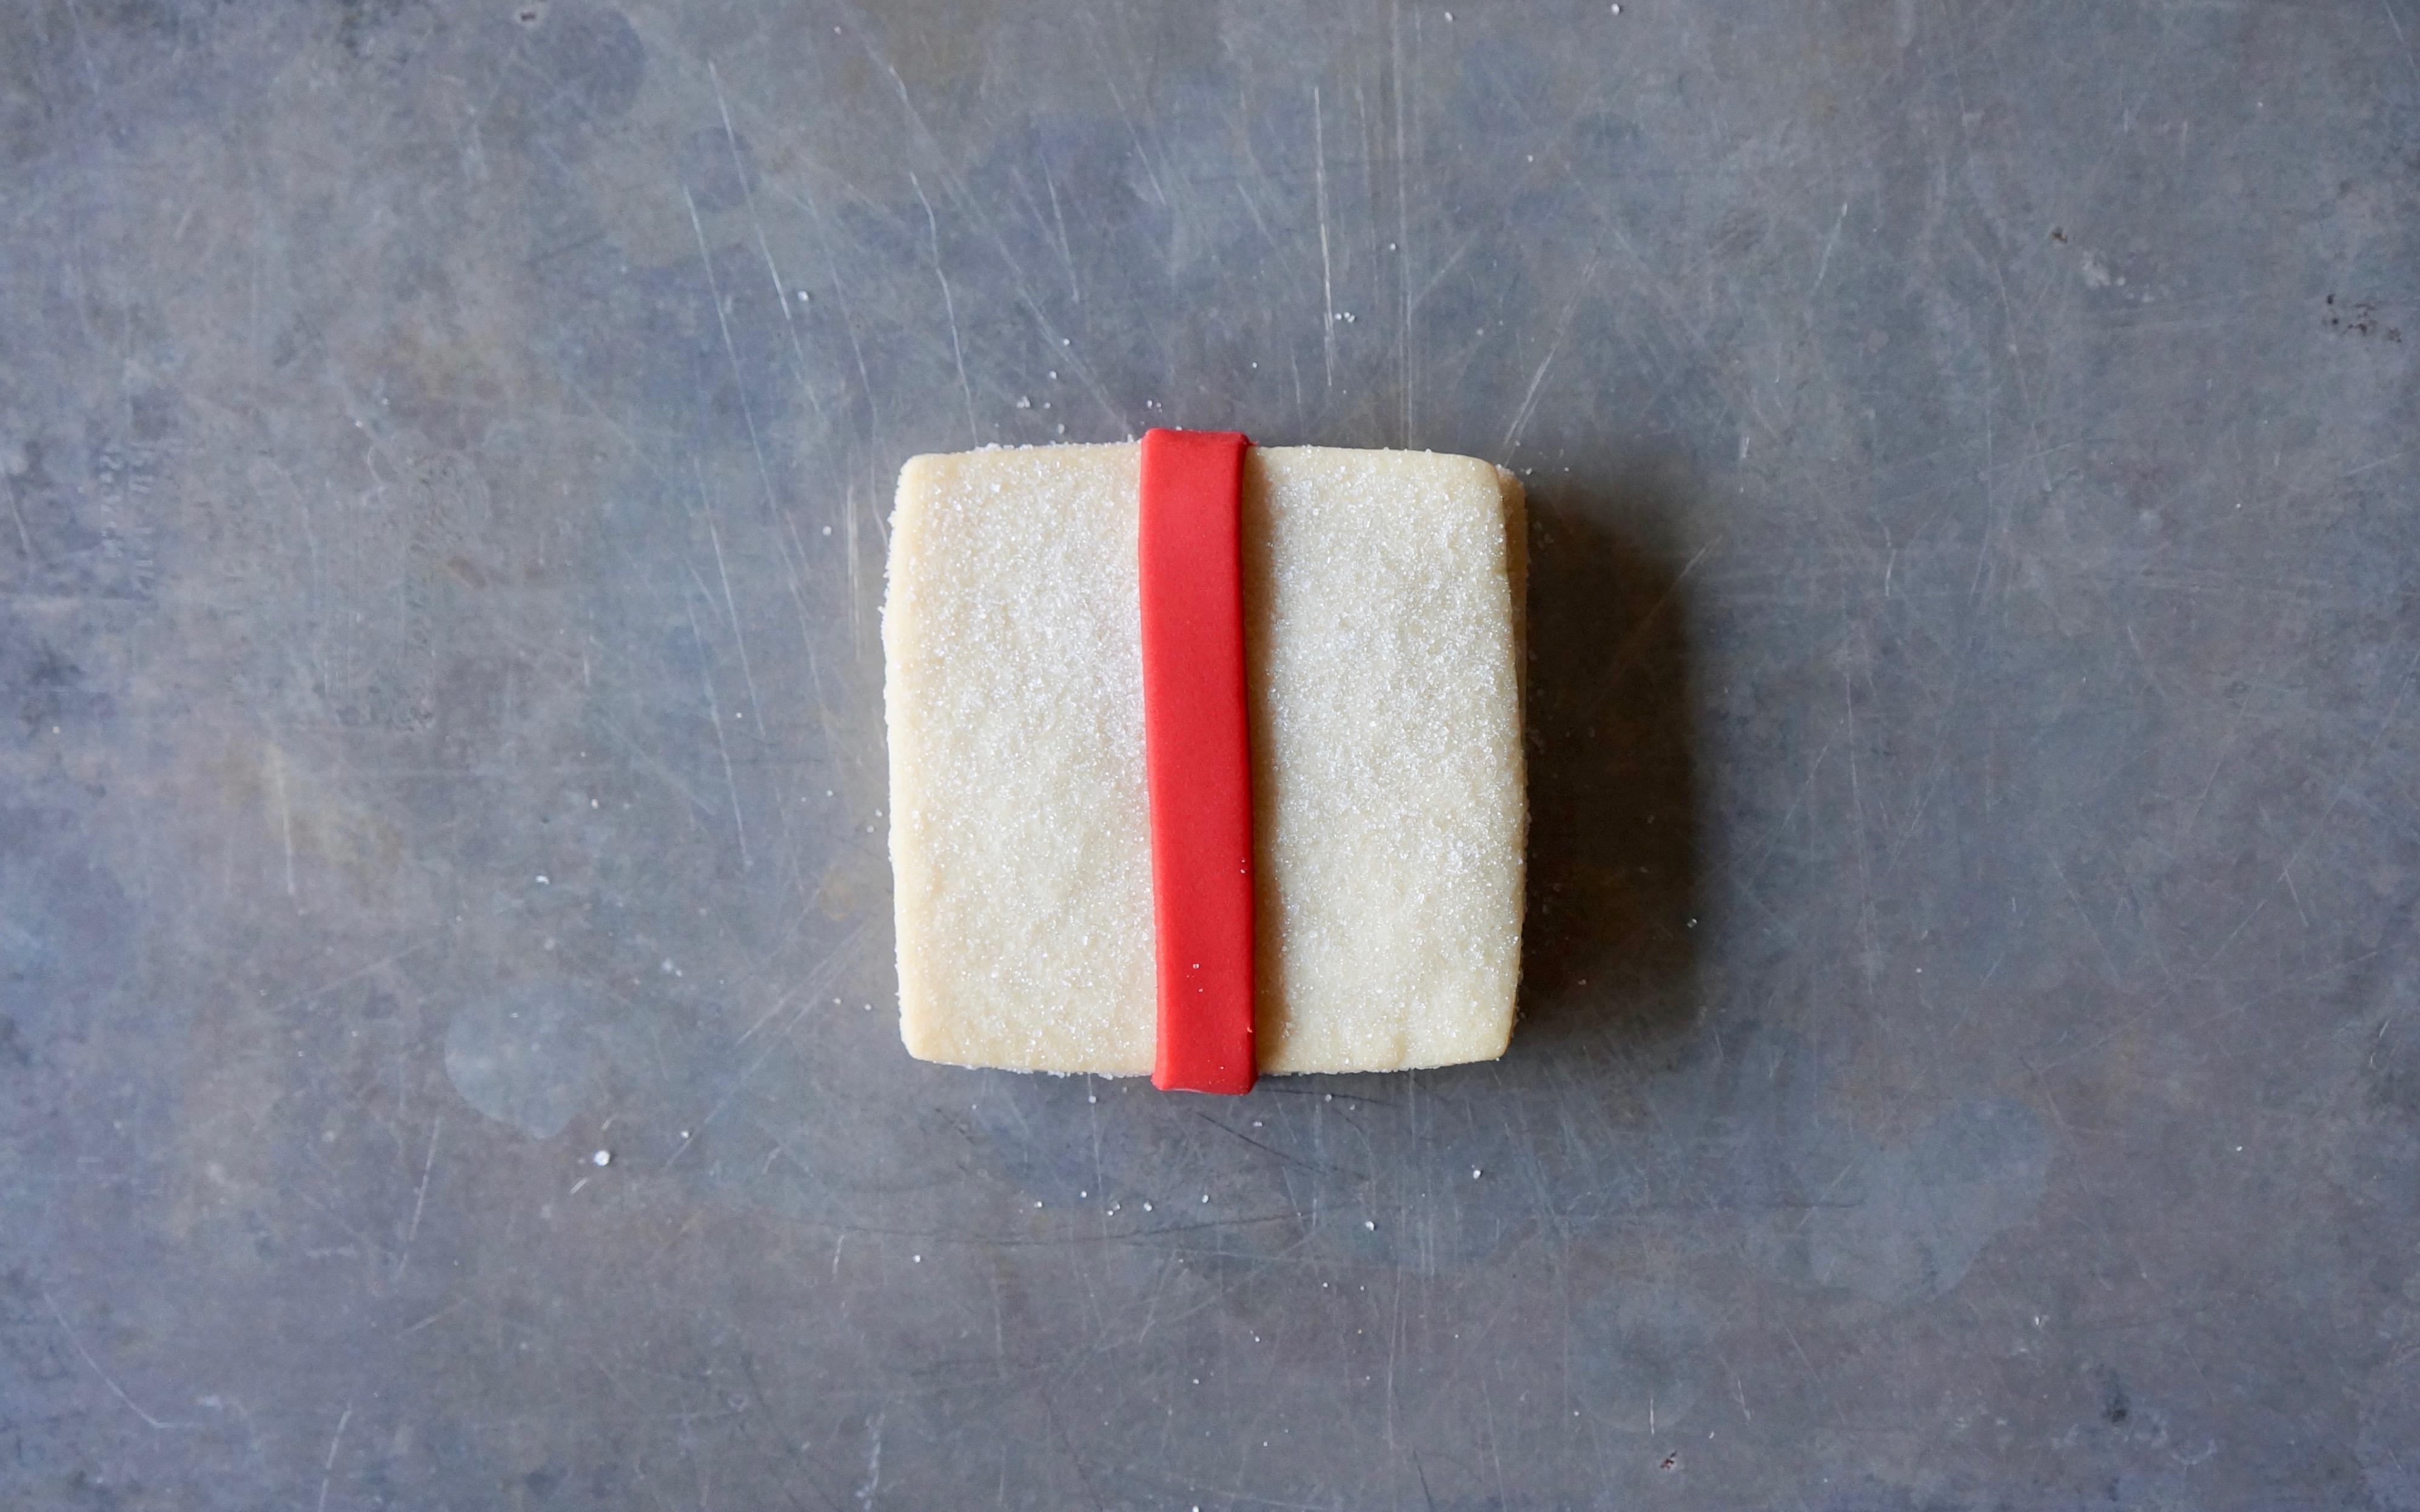 How-To-Make-Gift-Box-Sugar-Cookies-Rebecca-Gordon-Buttermilk-LIpstick-Culinary-Entertaining-Techniques-RebeccaGordon-Pastry-Chef-Birmingham-Alabama